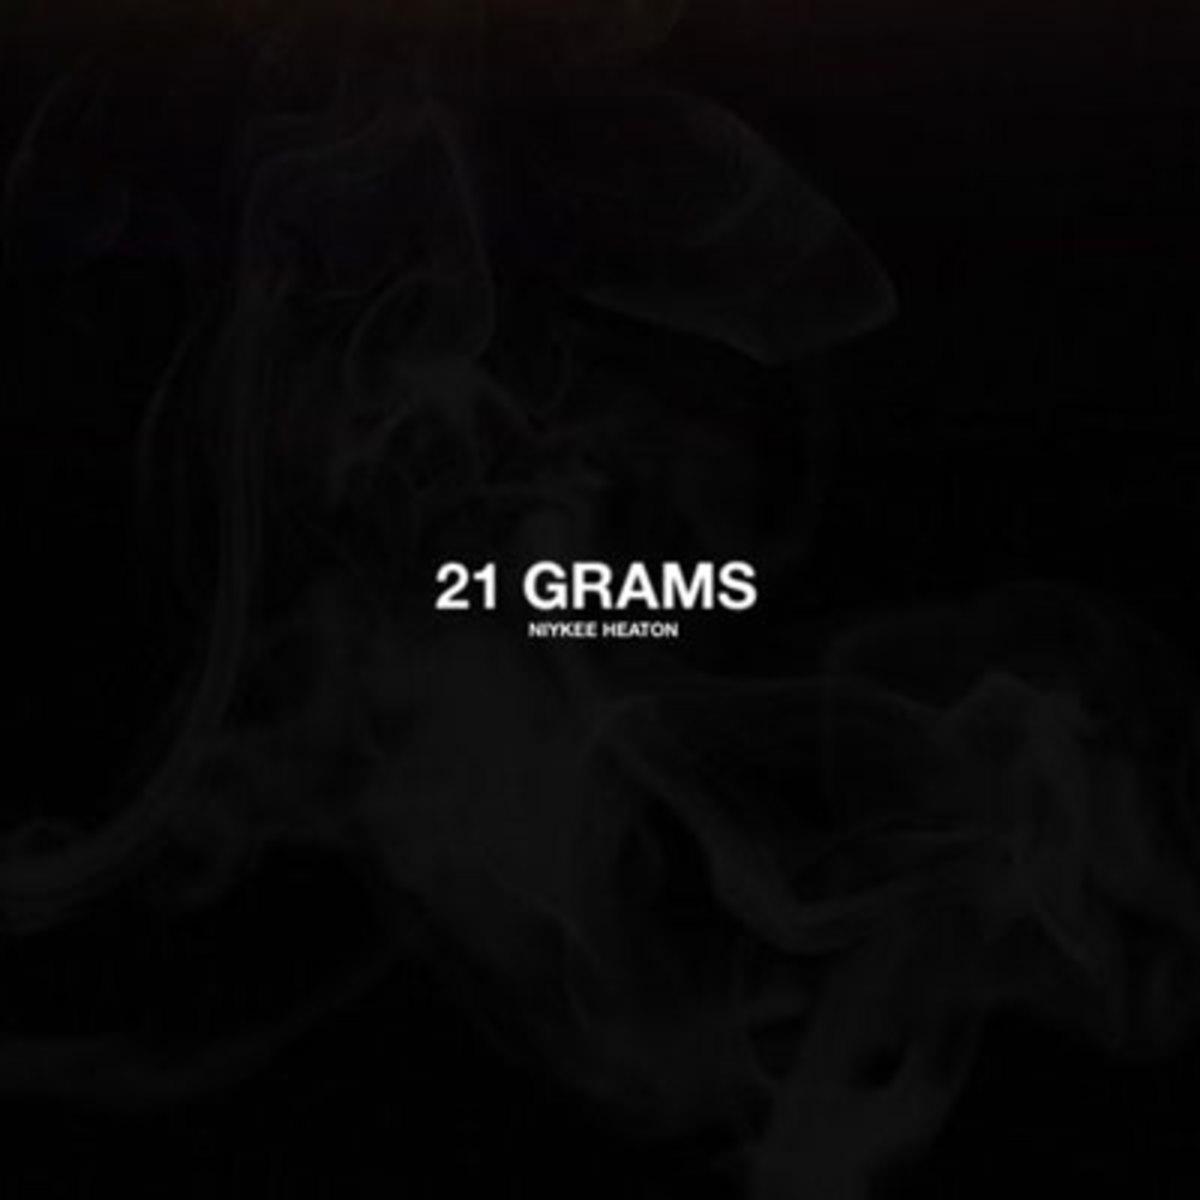 niykee-heaton-21-grams.jpg